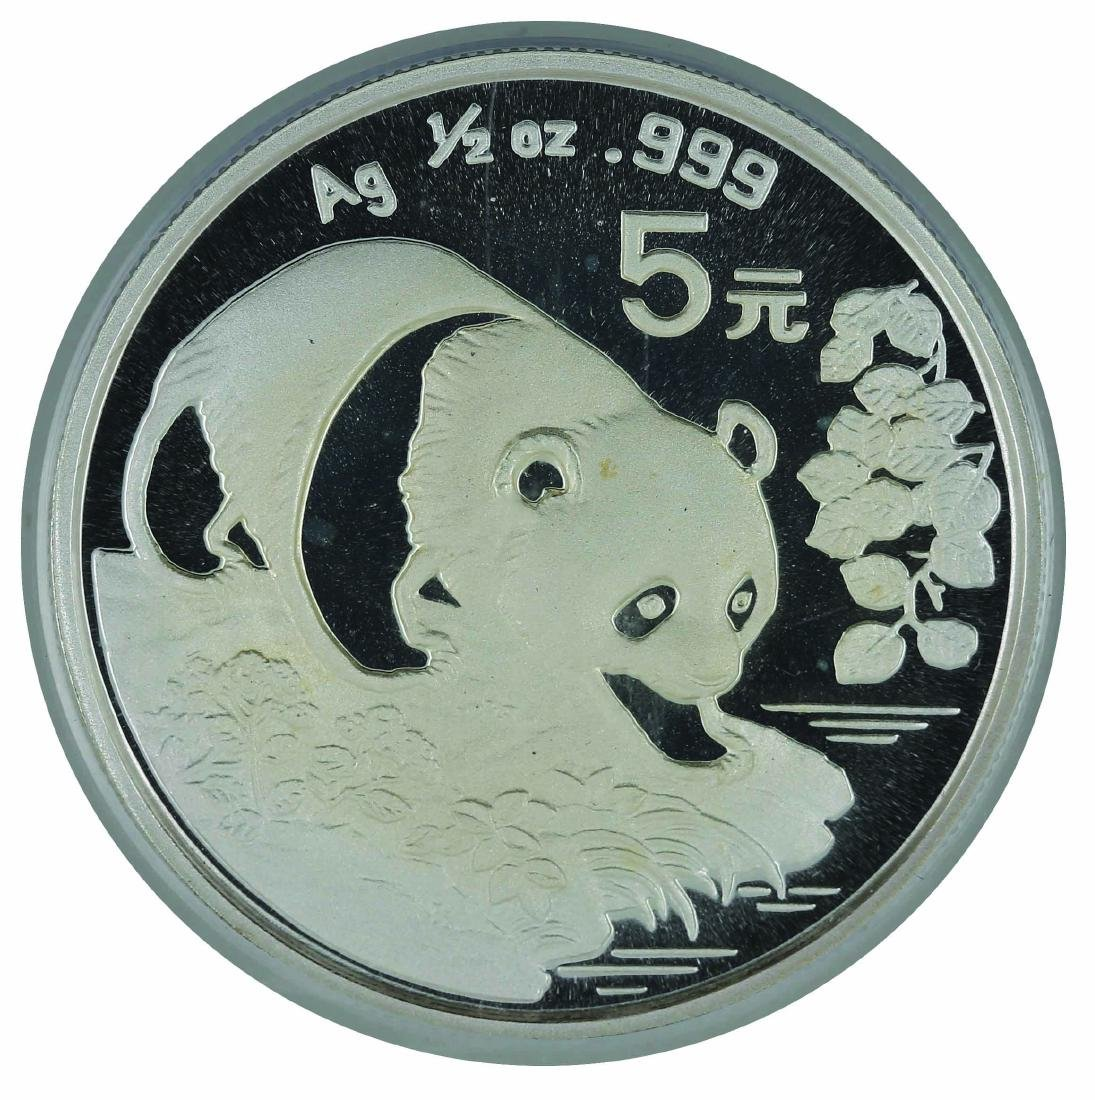 China 1993, 5 Yuan Panda Silver Commemorative Coin, 1/2